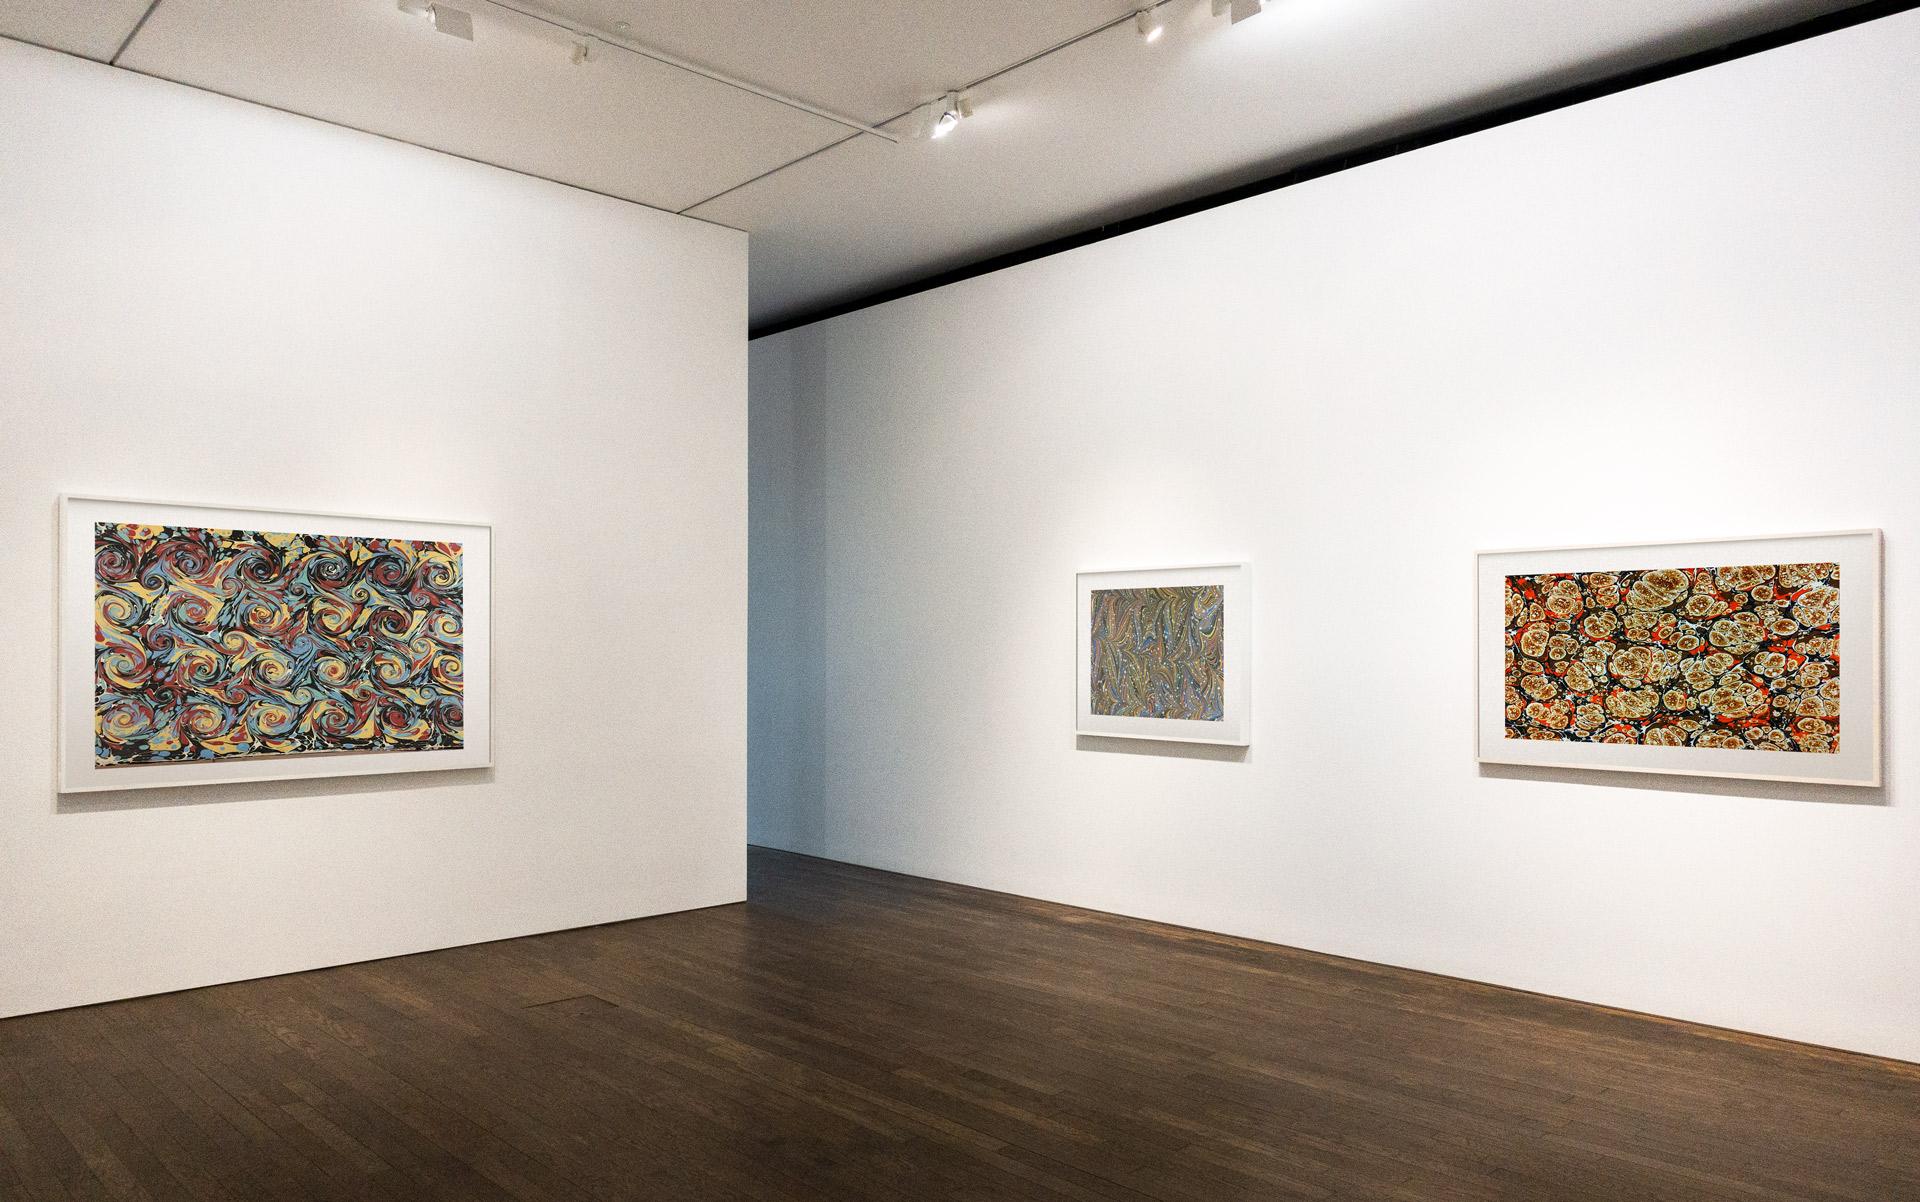 Forwart gallery